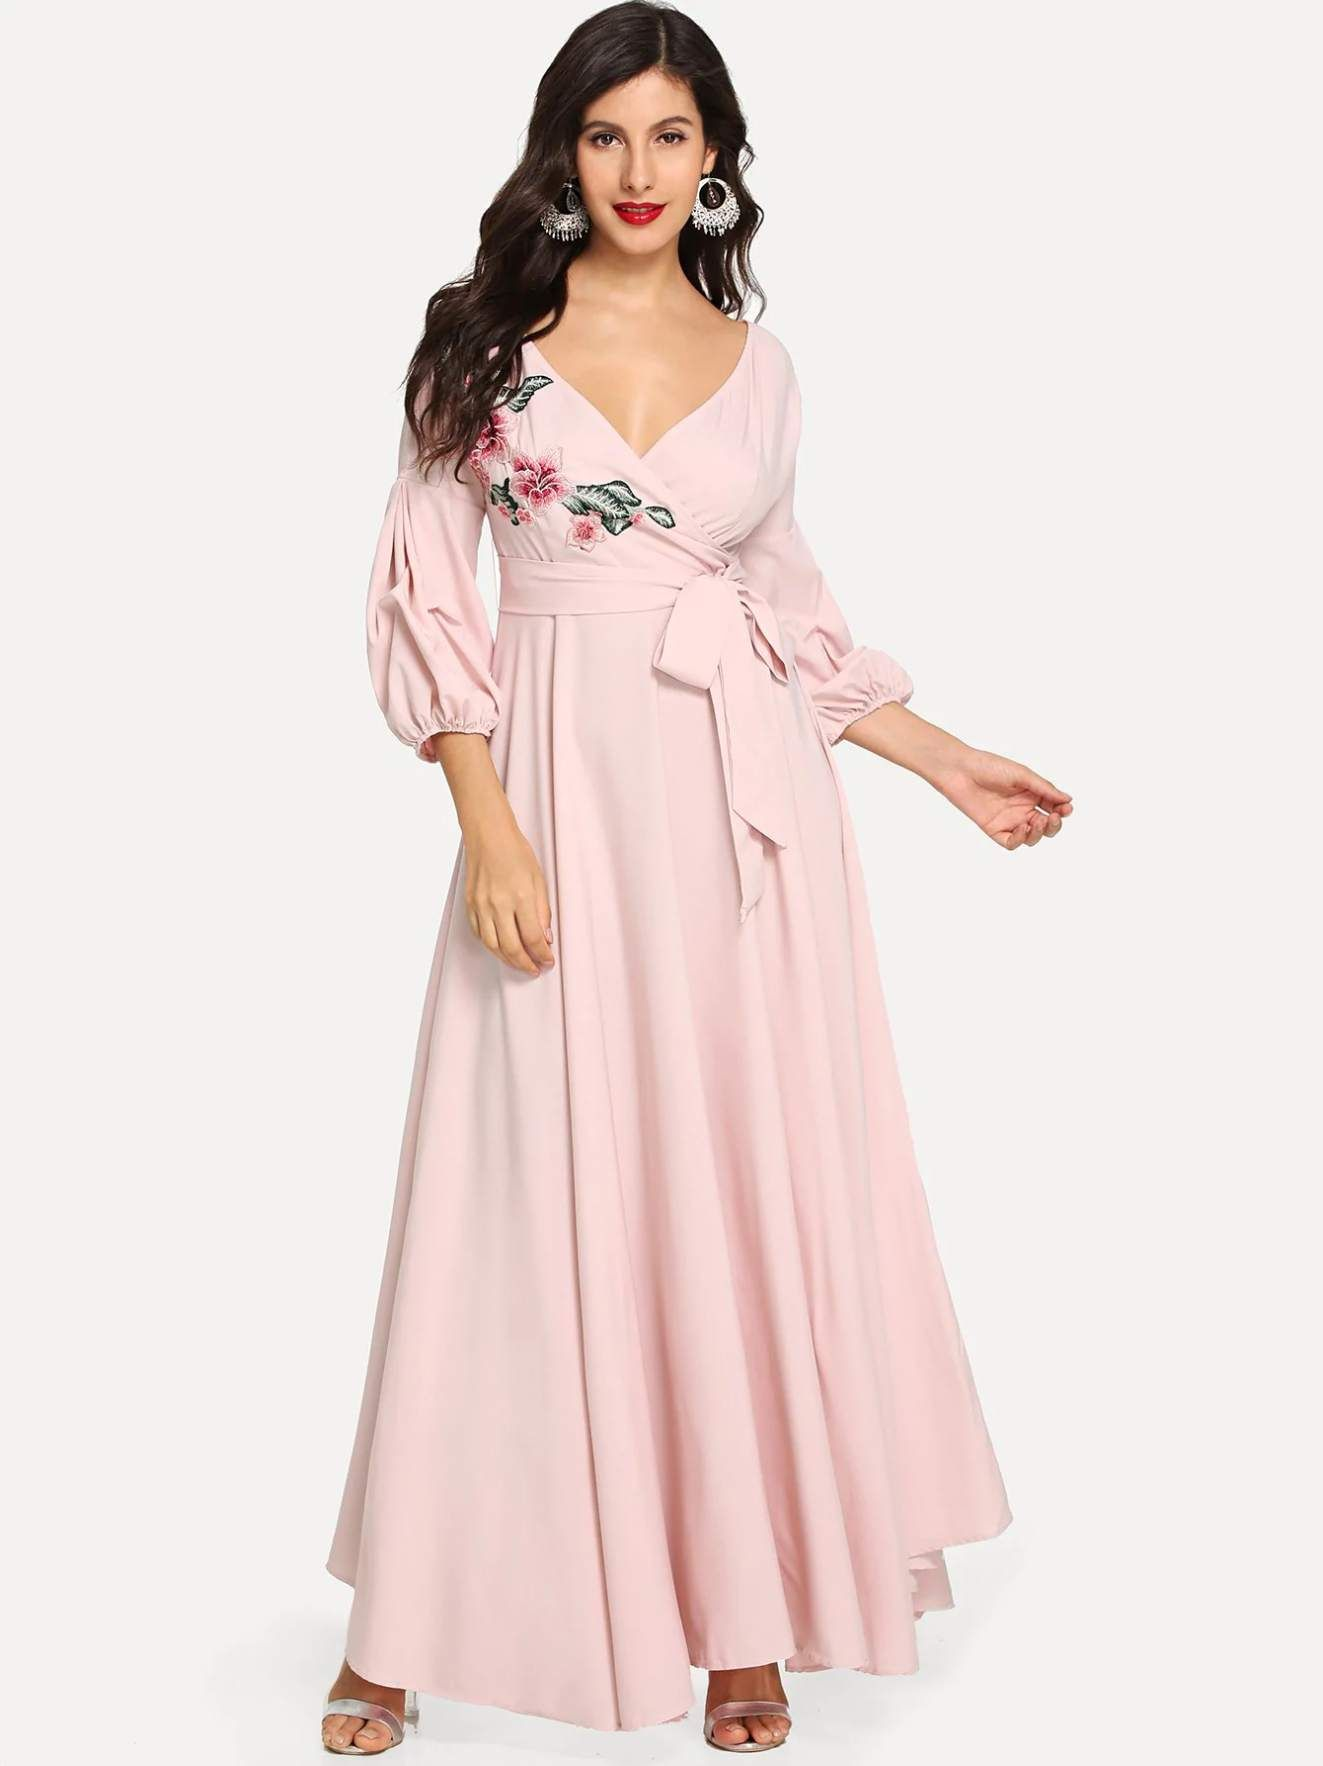 23 Flower Patch Puff Sleeve Surplice Wrap Dress Surplice Wrap Dress Dresses Dressy Dresses [ 1766 x 1323 Pixel ]